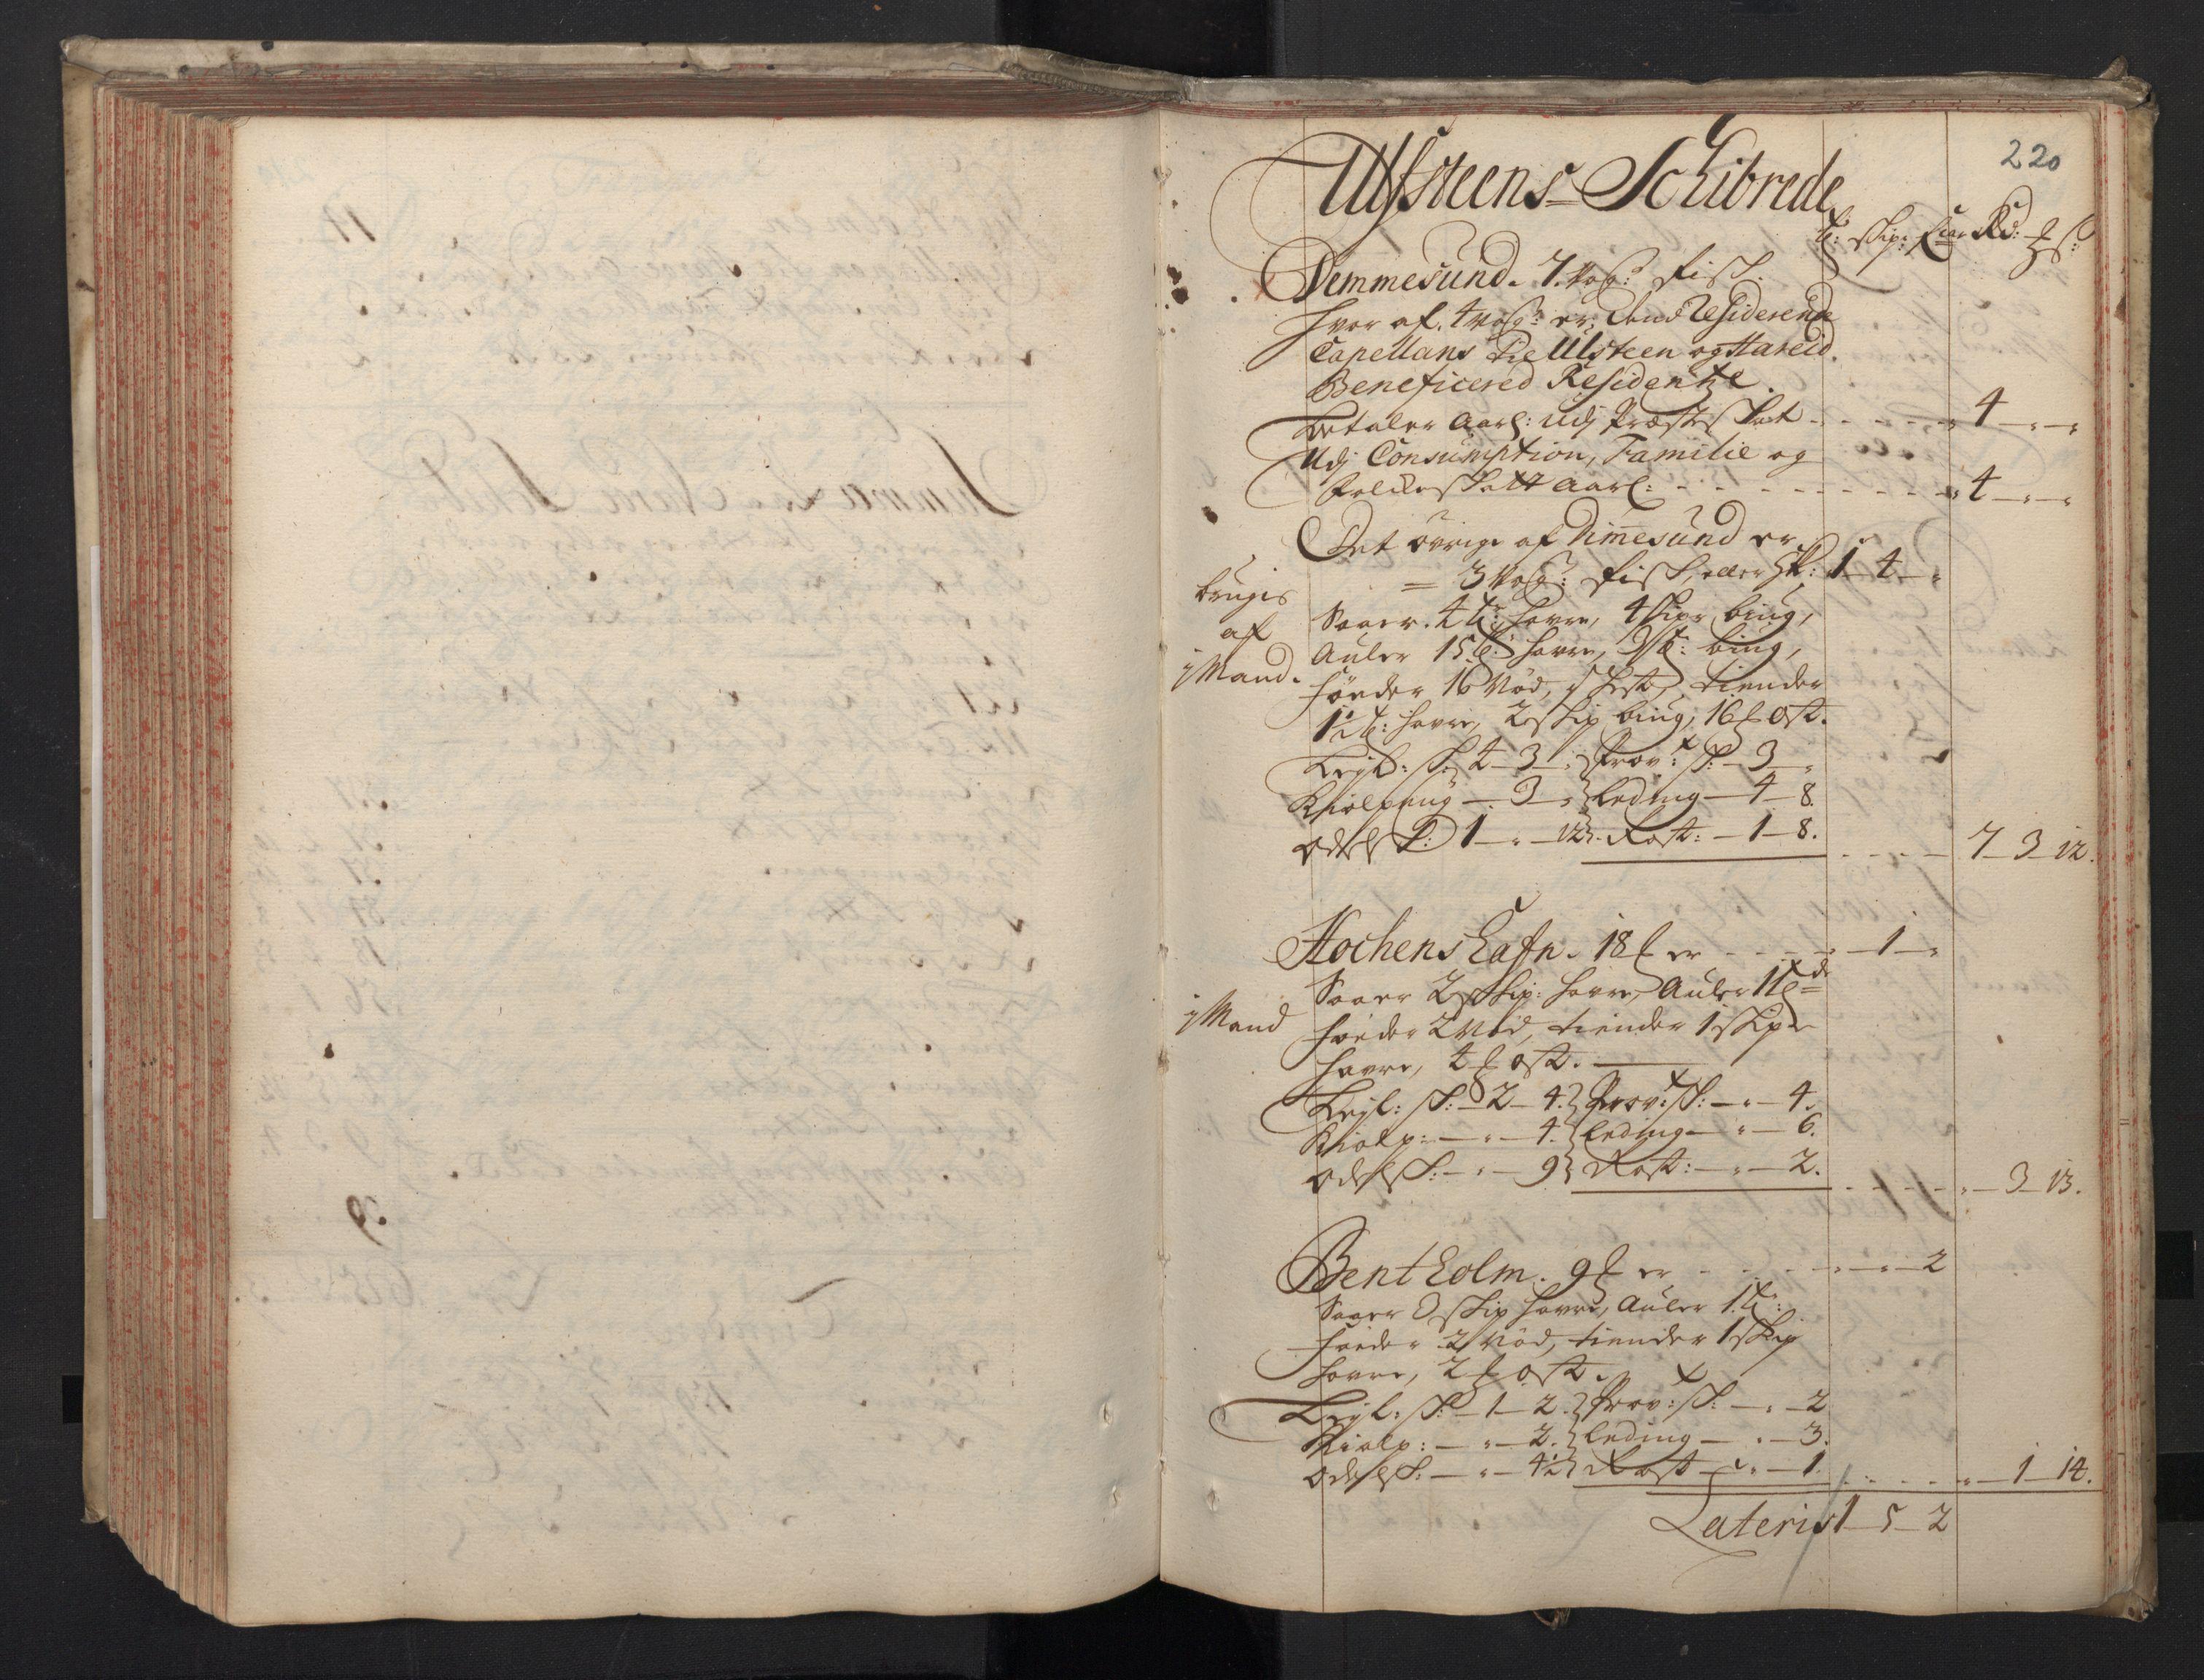 RA, Rentekammeret inntil 1814, Realistisk ordnet avdeling, N/Nb/Nbf/L0148: Sunnmøre, prøvematrikkel, 1714, s. 219b-220a